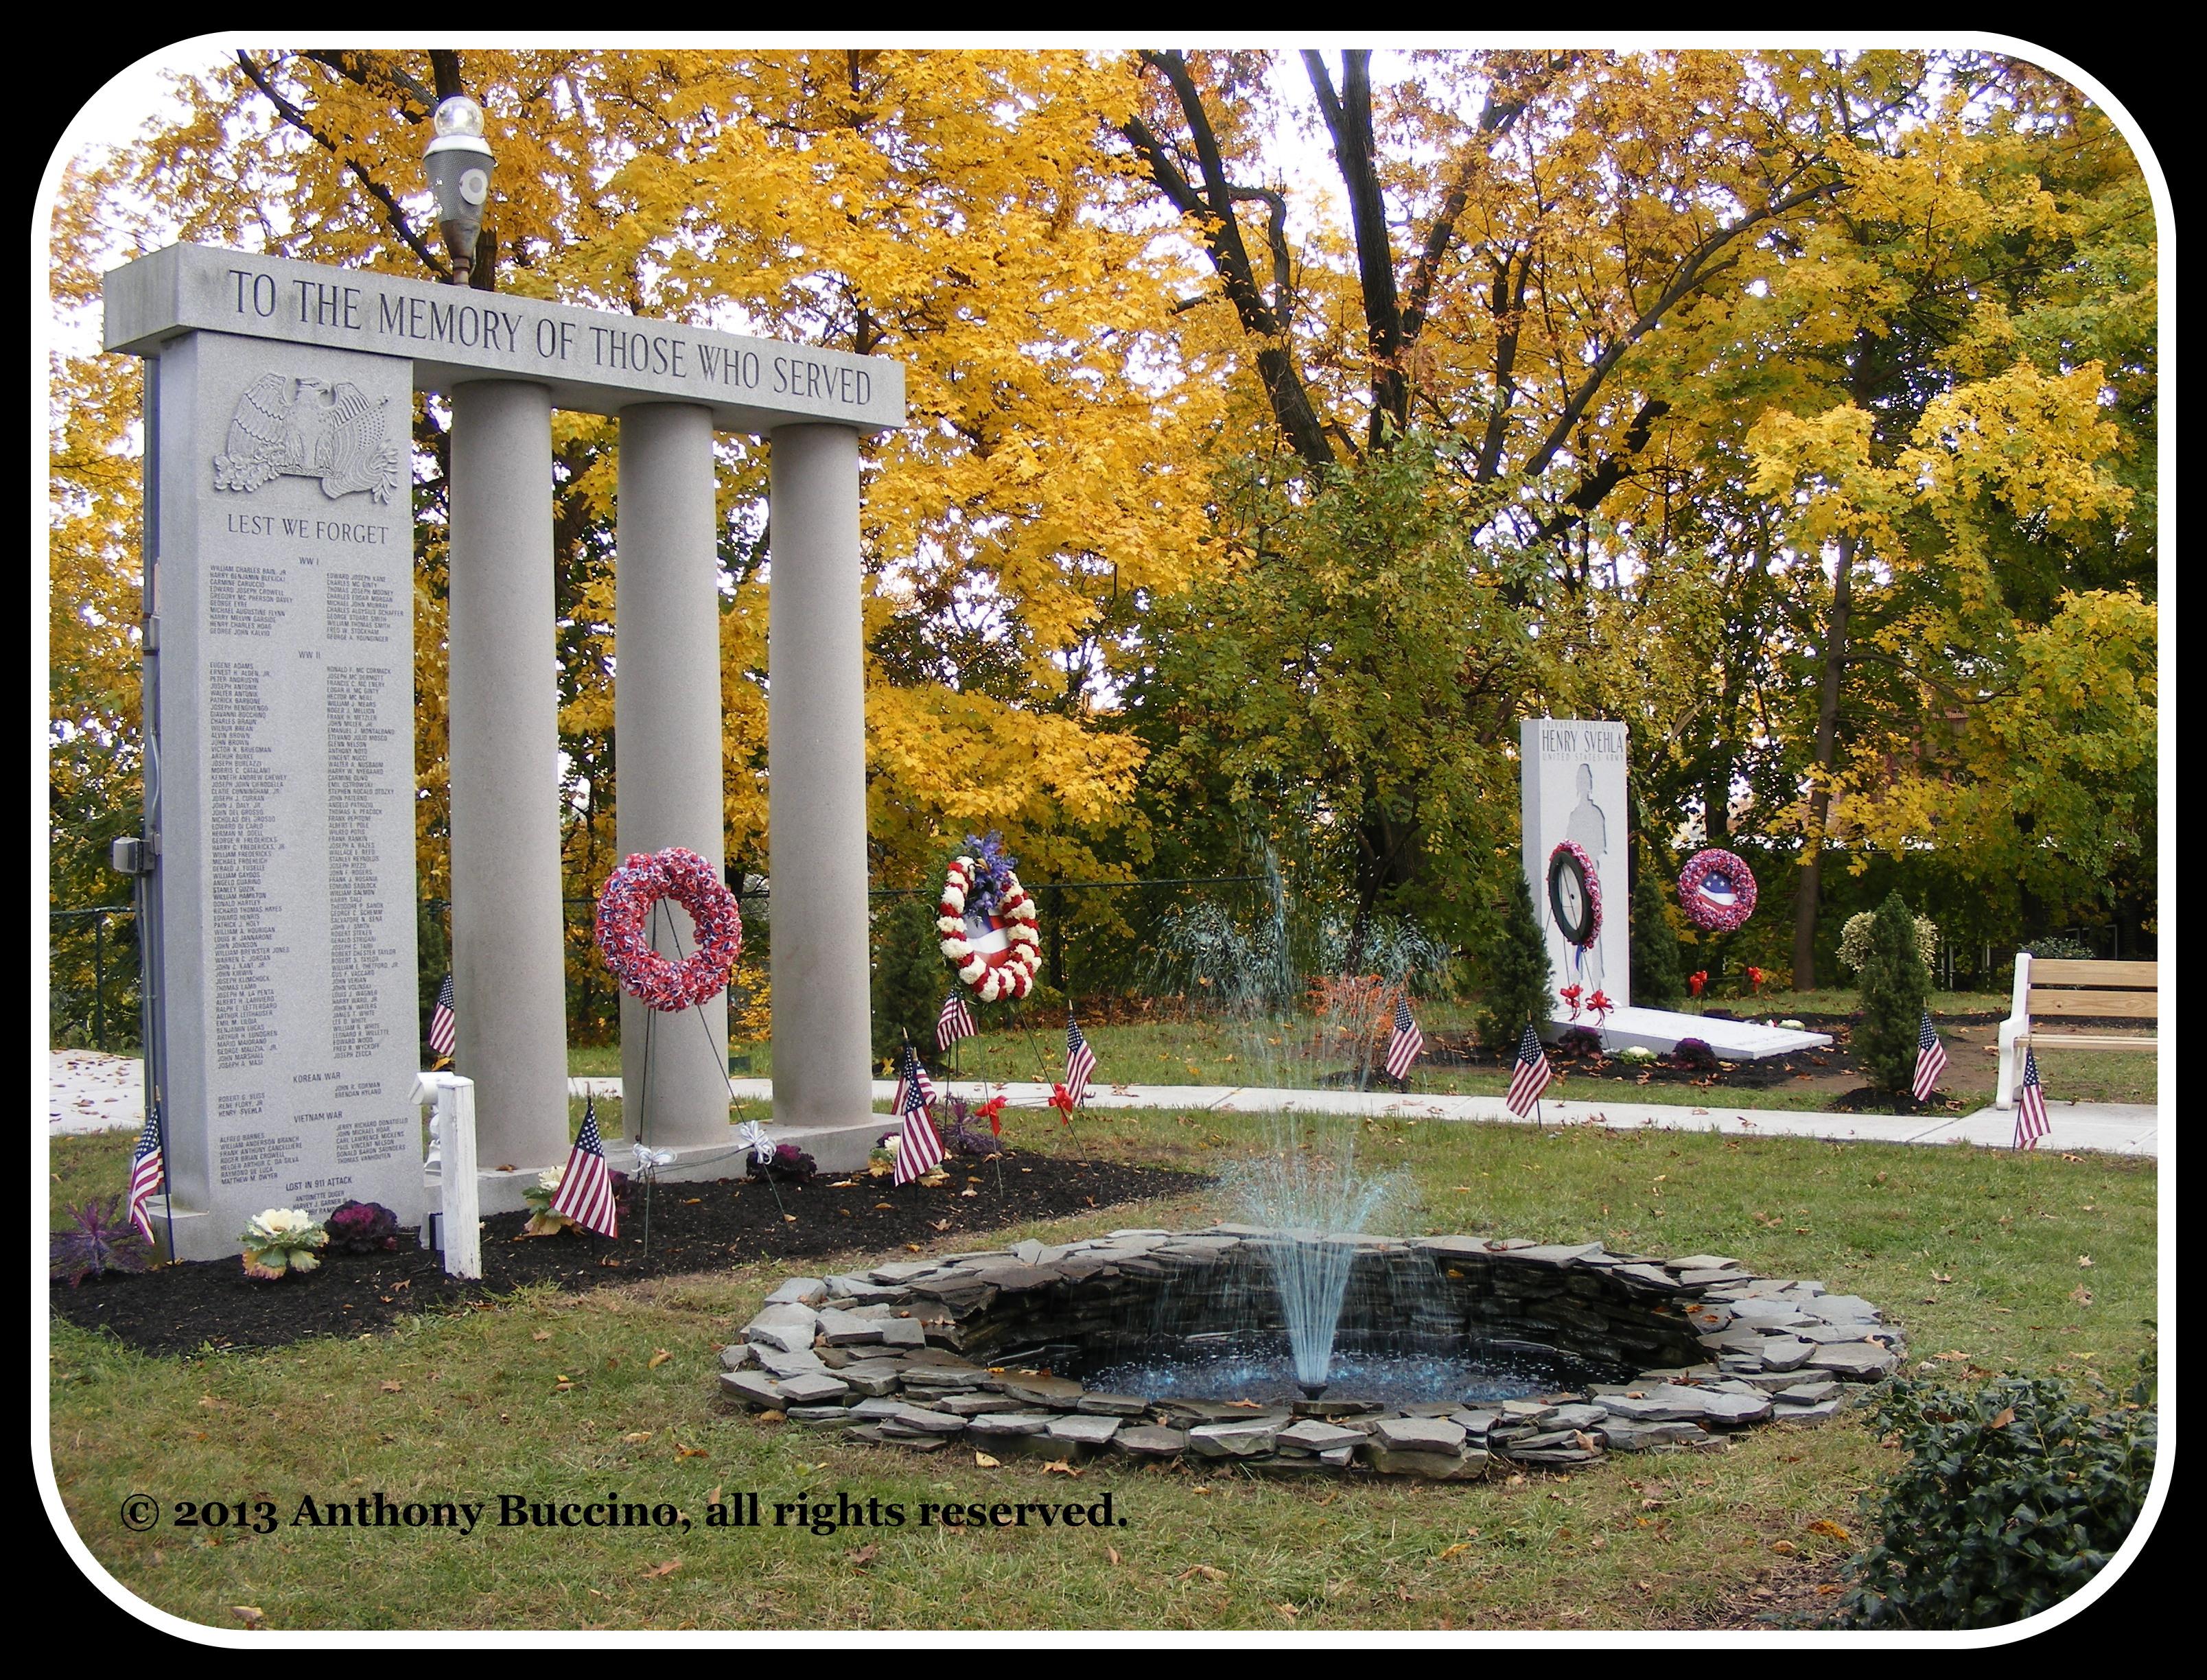 Belleville Sons Honor Roll Men Who Died In Service From Belleville Nj